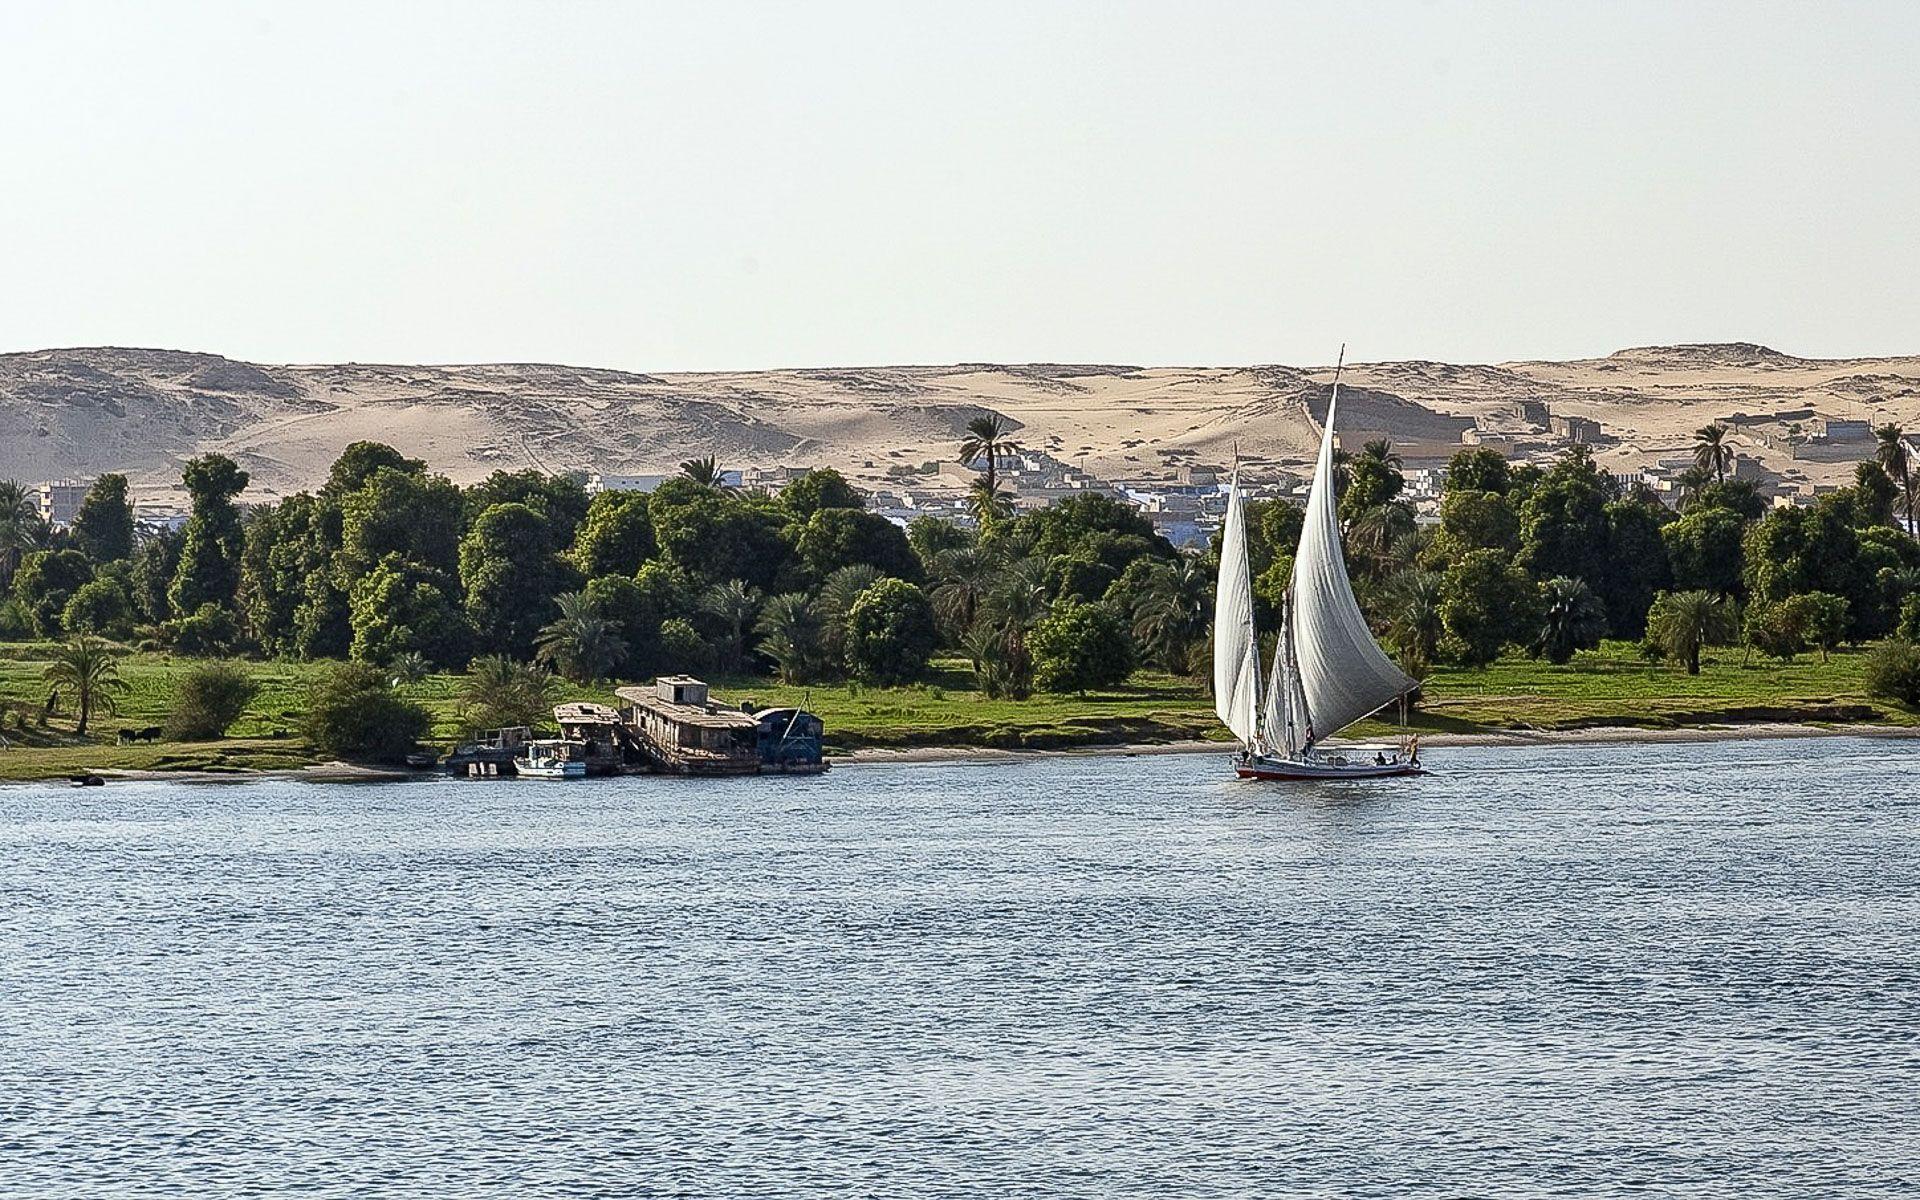 LesVoyageuses-organiser-voyage-egypte-conseils-20